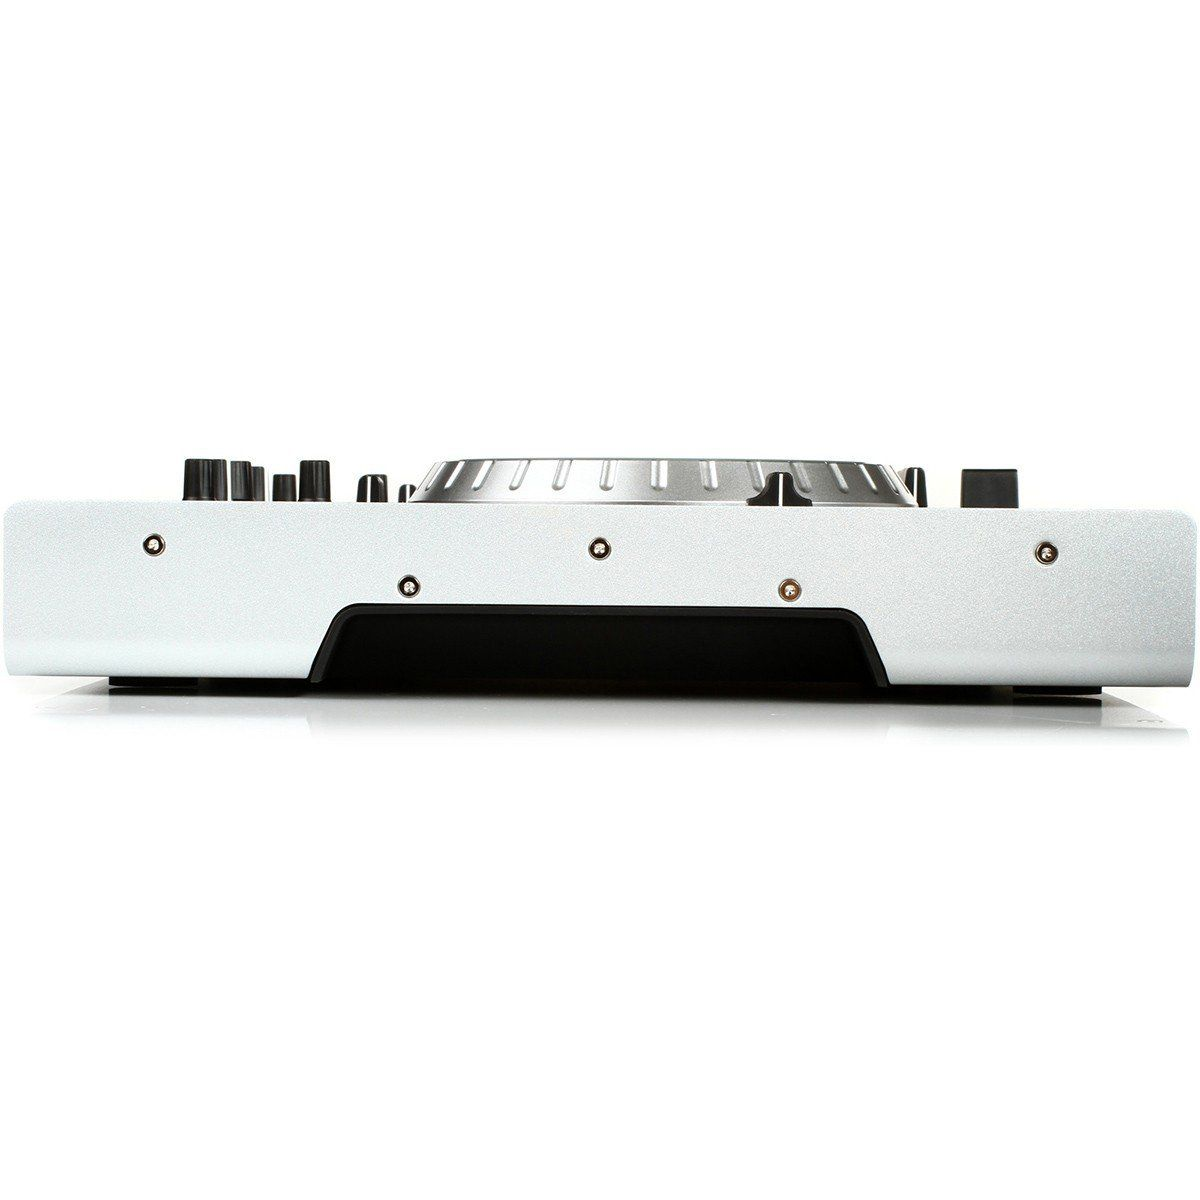 Numark NS-6 Midi Controladora Dj NS6 4-Decks 4-Canais USB Serato ITCh